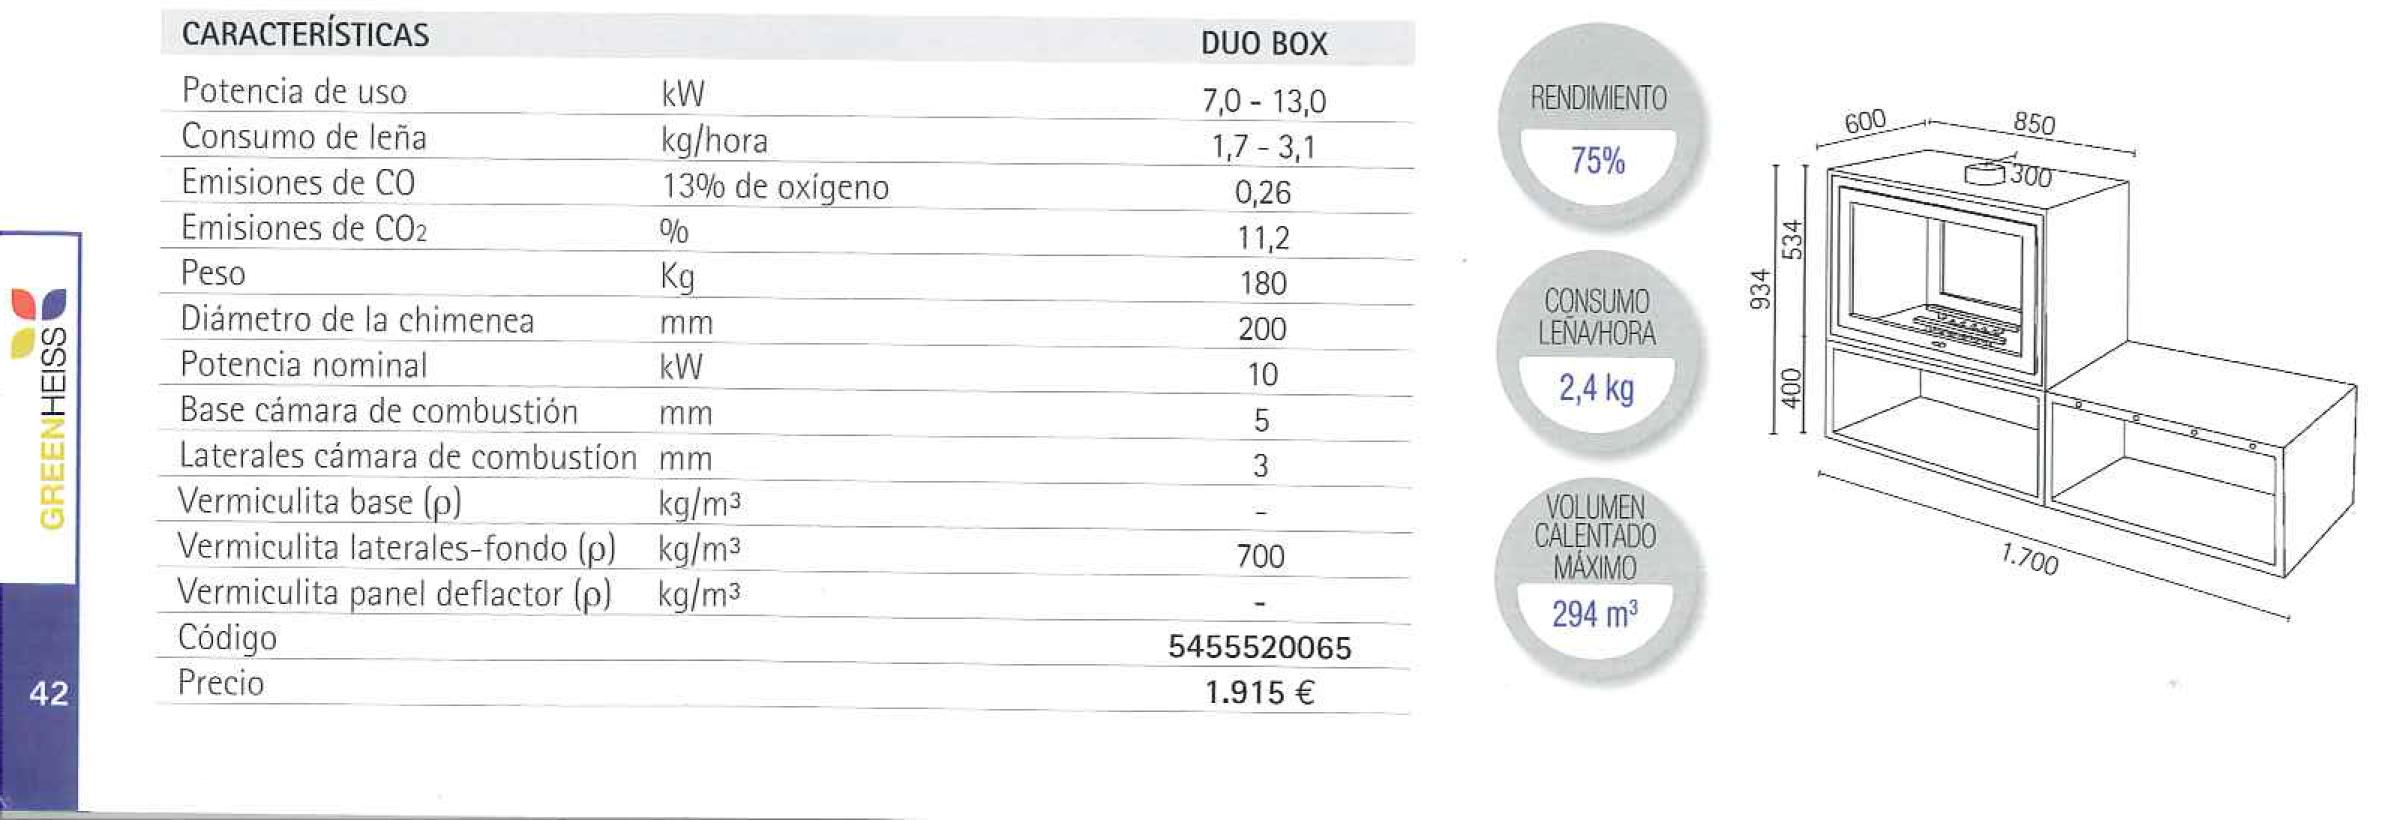 ficha_tecnica_duo_box.jpg